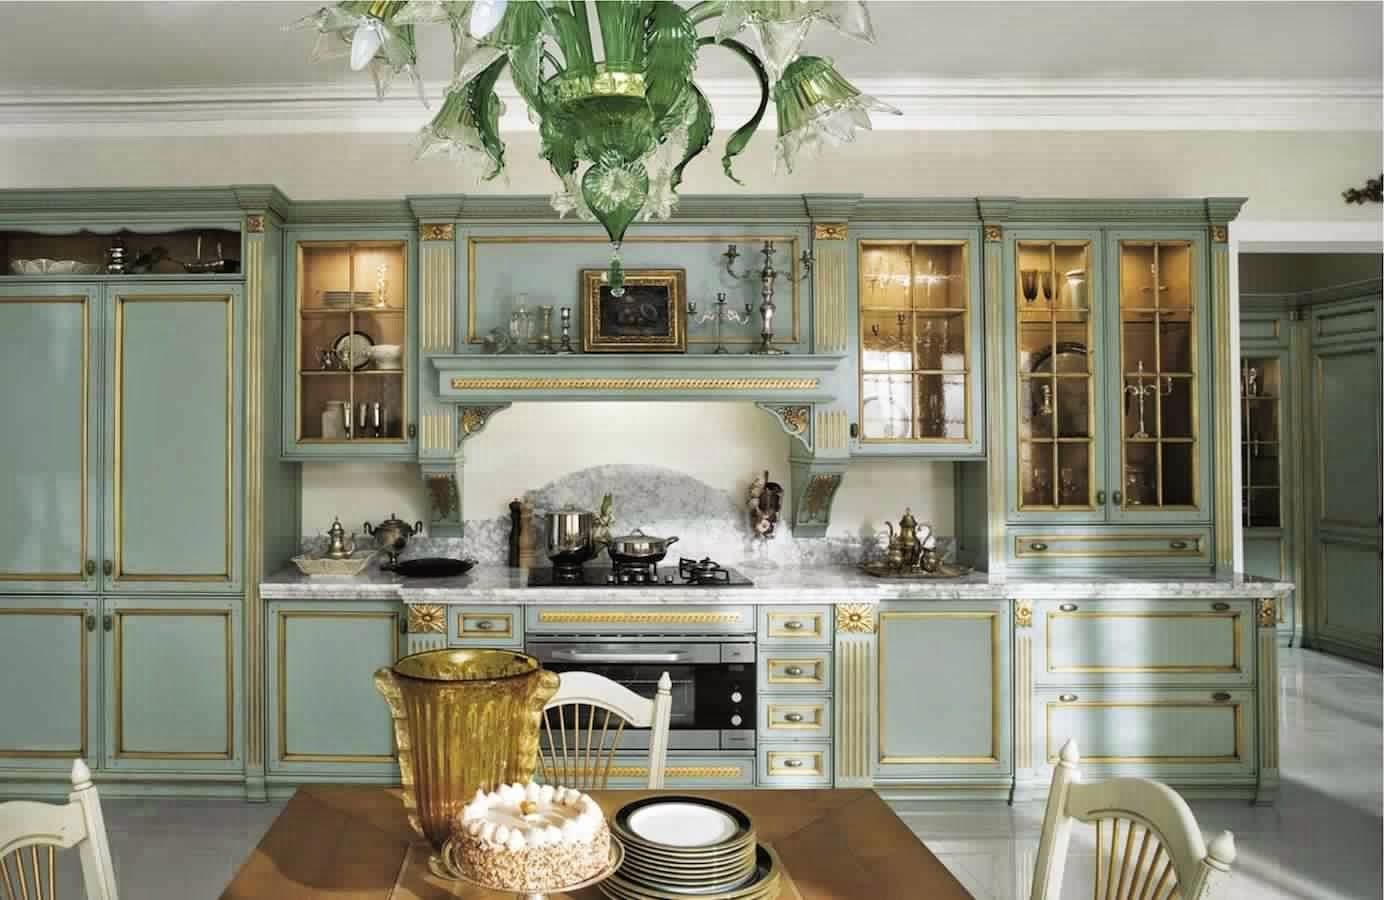 meuble cuisine italienne moderne modele cuisine moderne italienne img4 cuisine design avec ilot. Black Bedroom Furniture Sets. Home Design Ideas